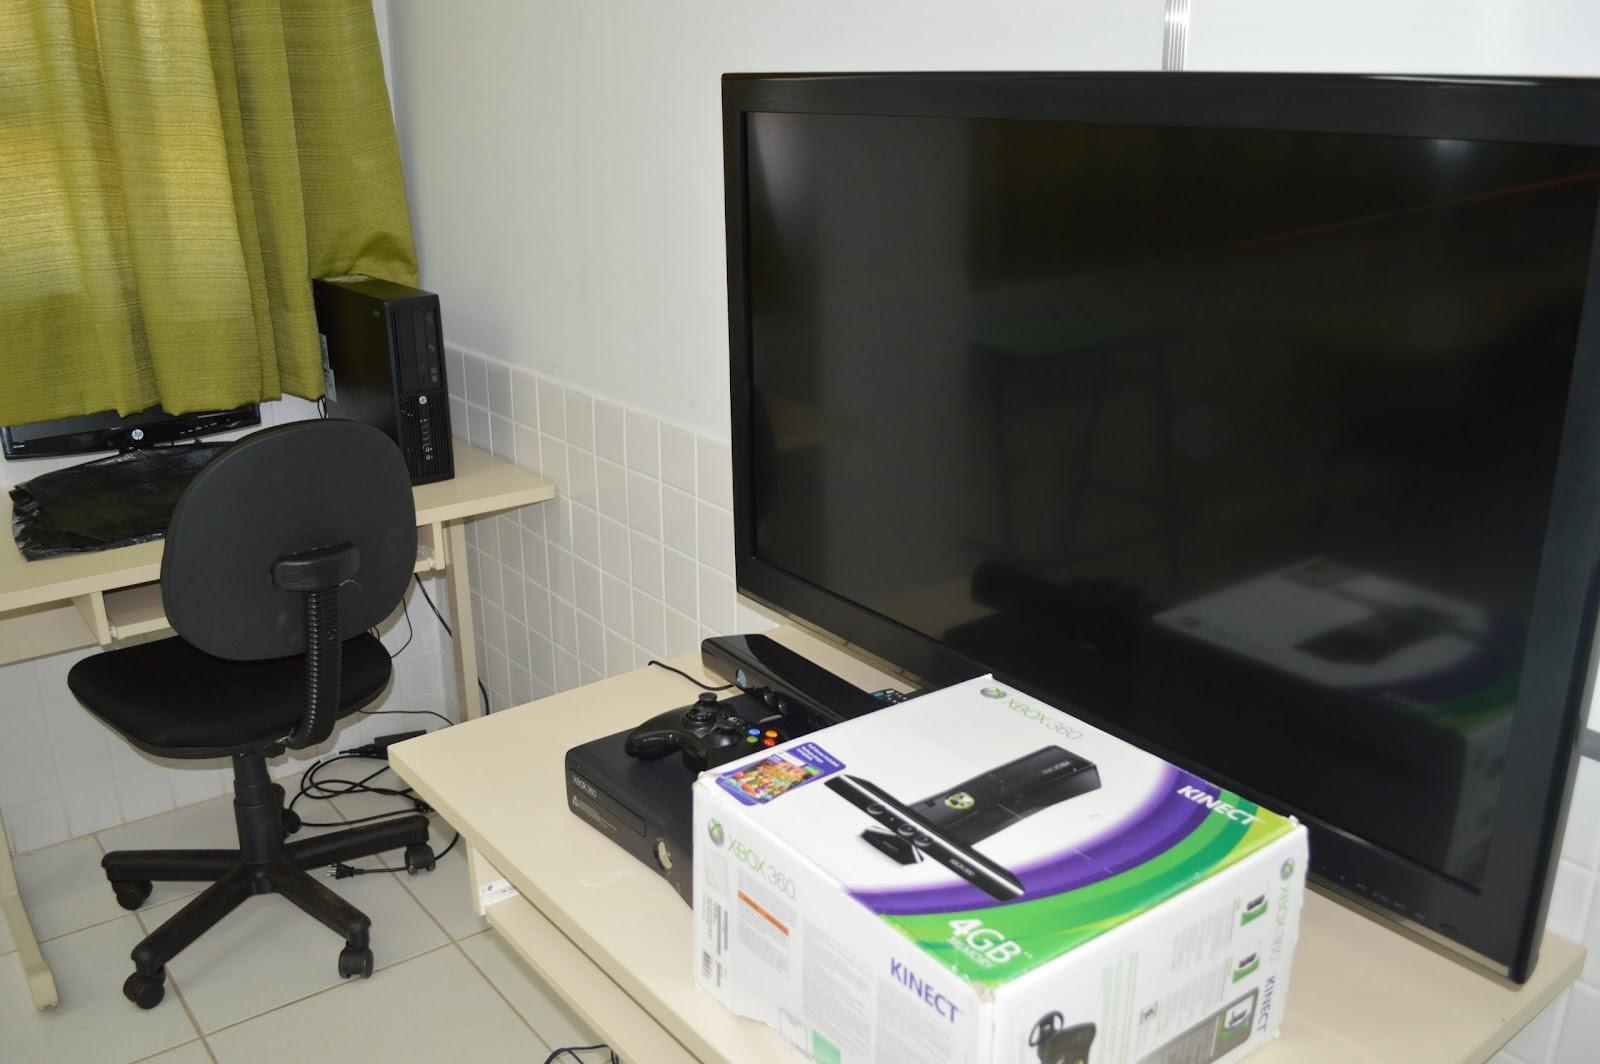 Console de video game.JPG